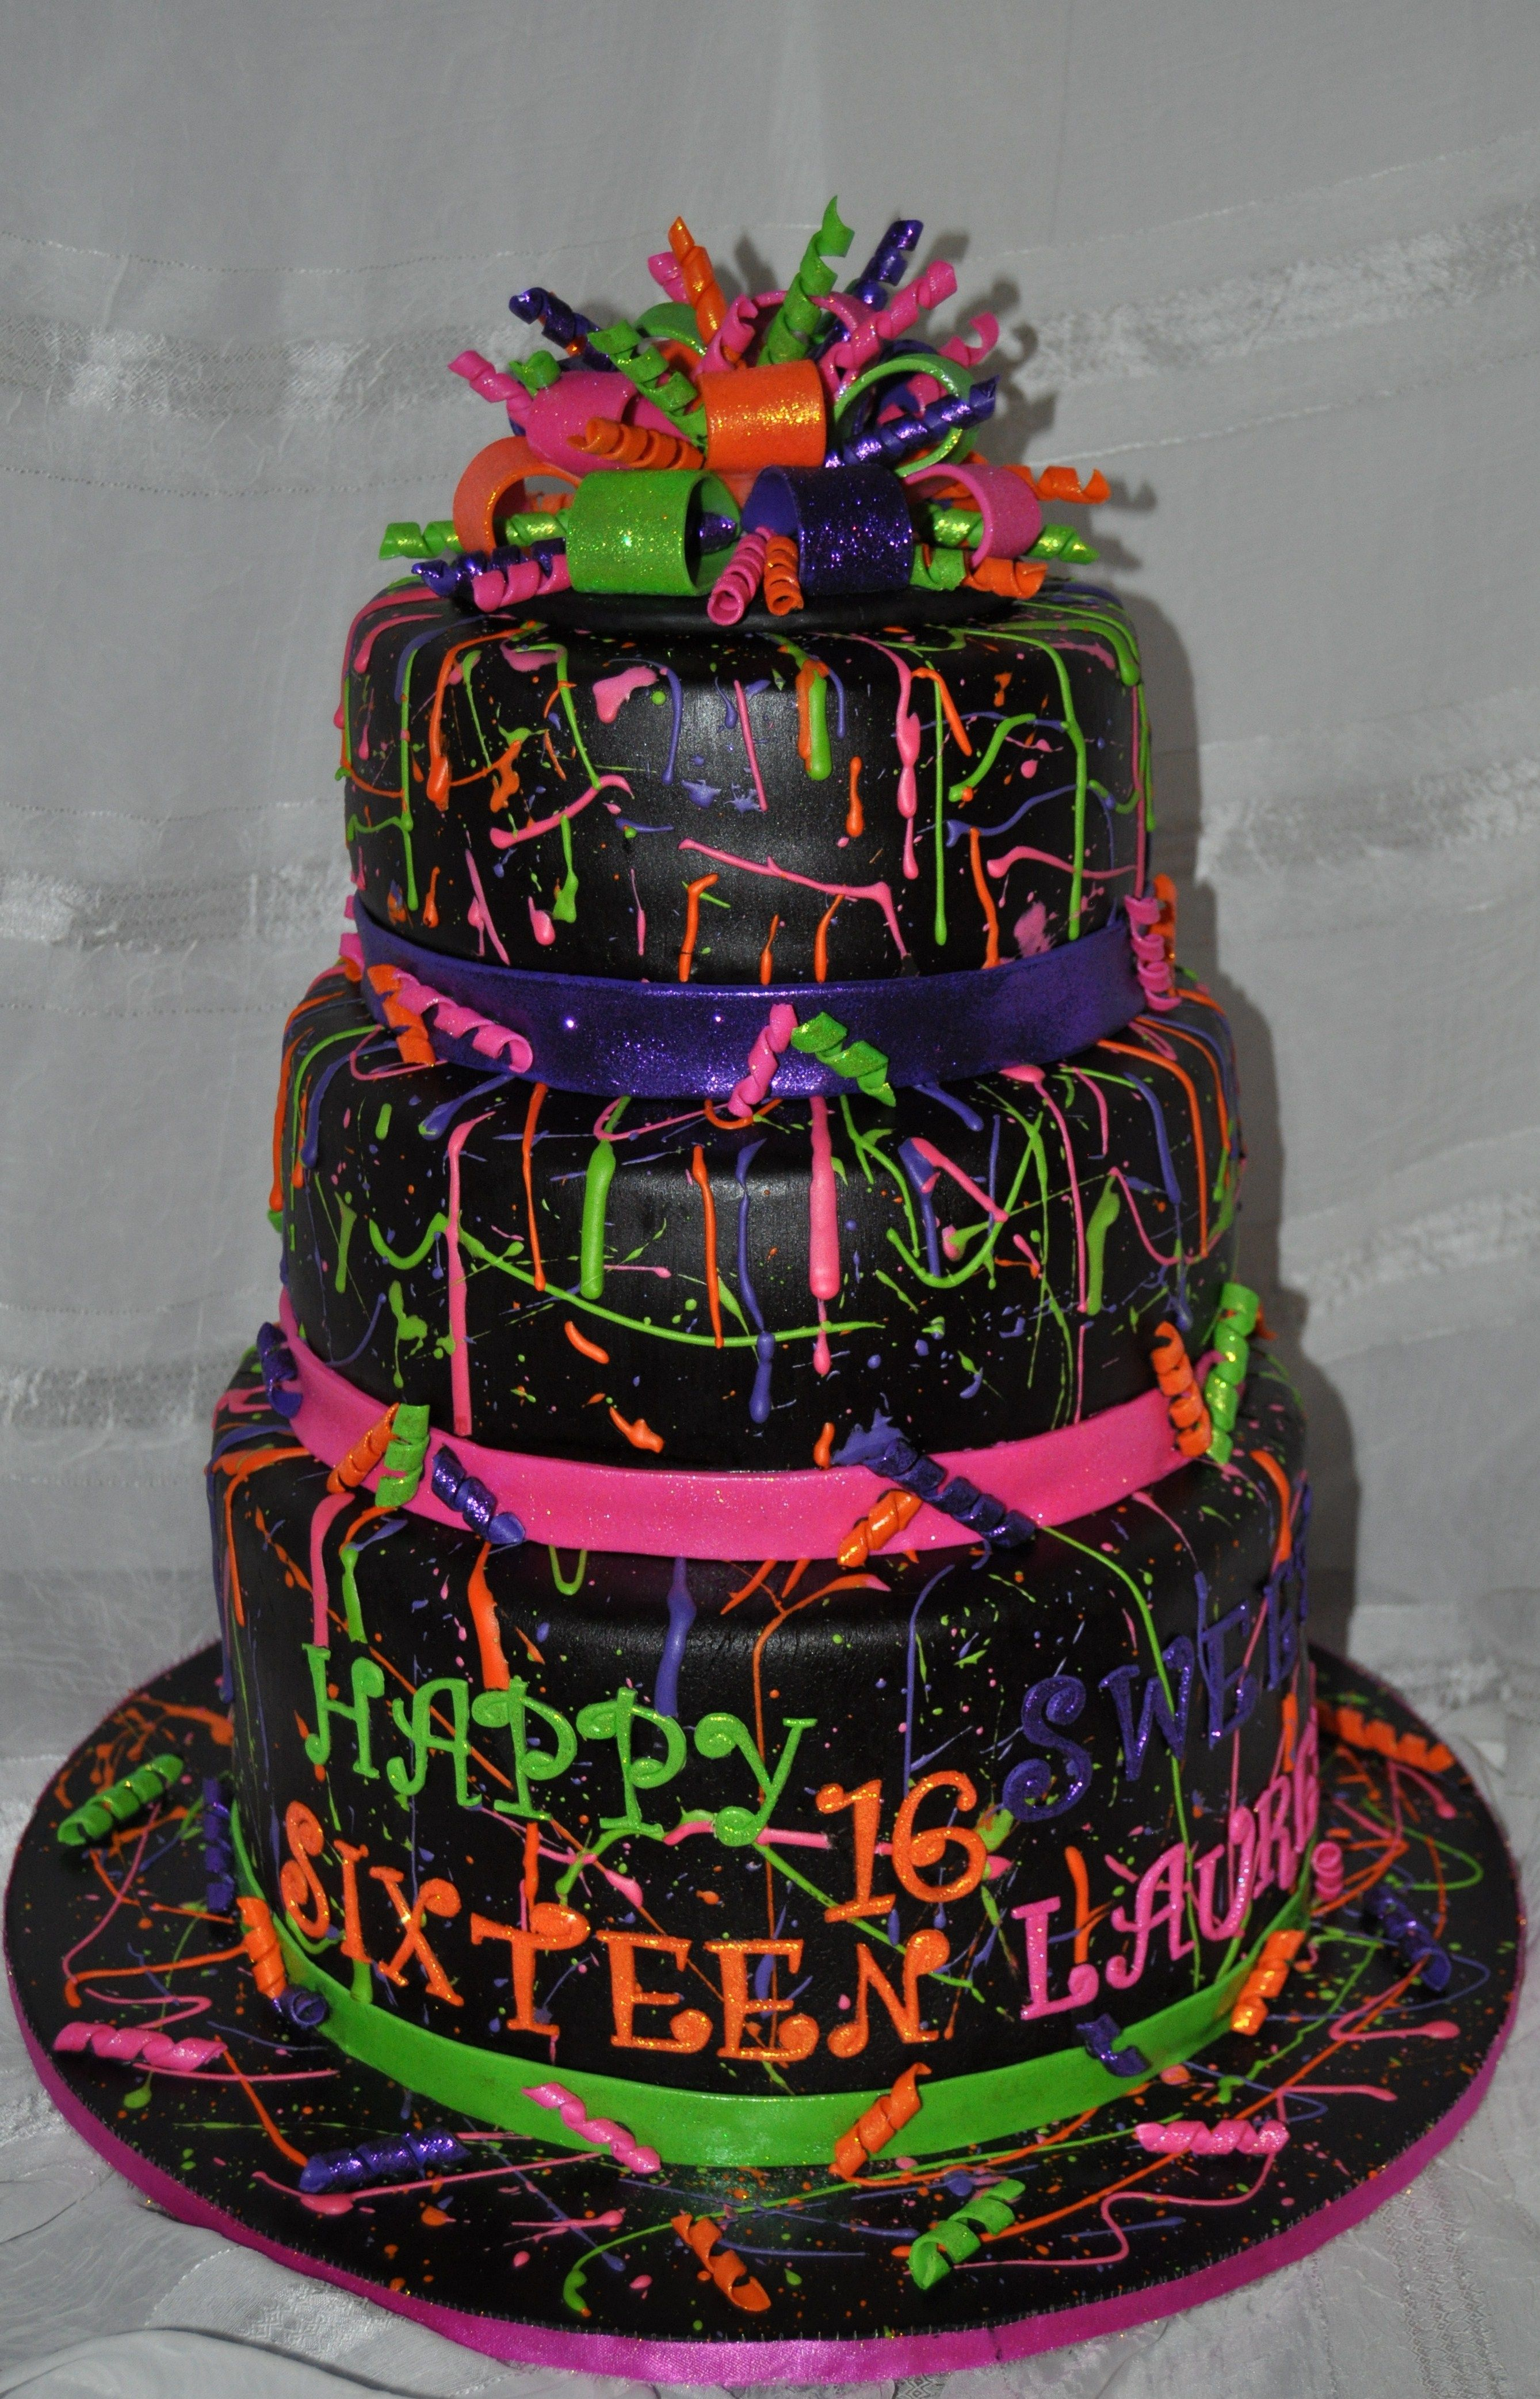 Neon Paint Splatter Cake Neon Paint Splattered Cake With